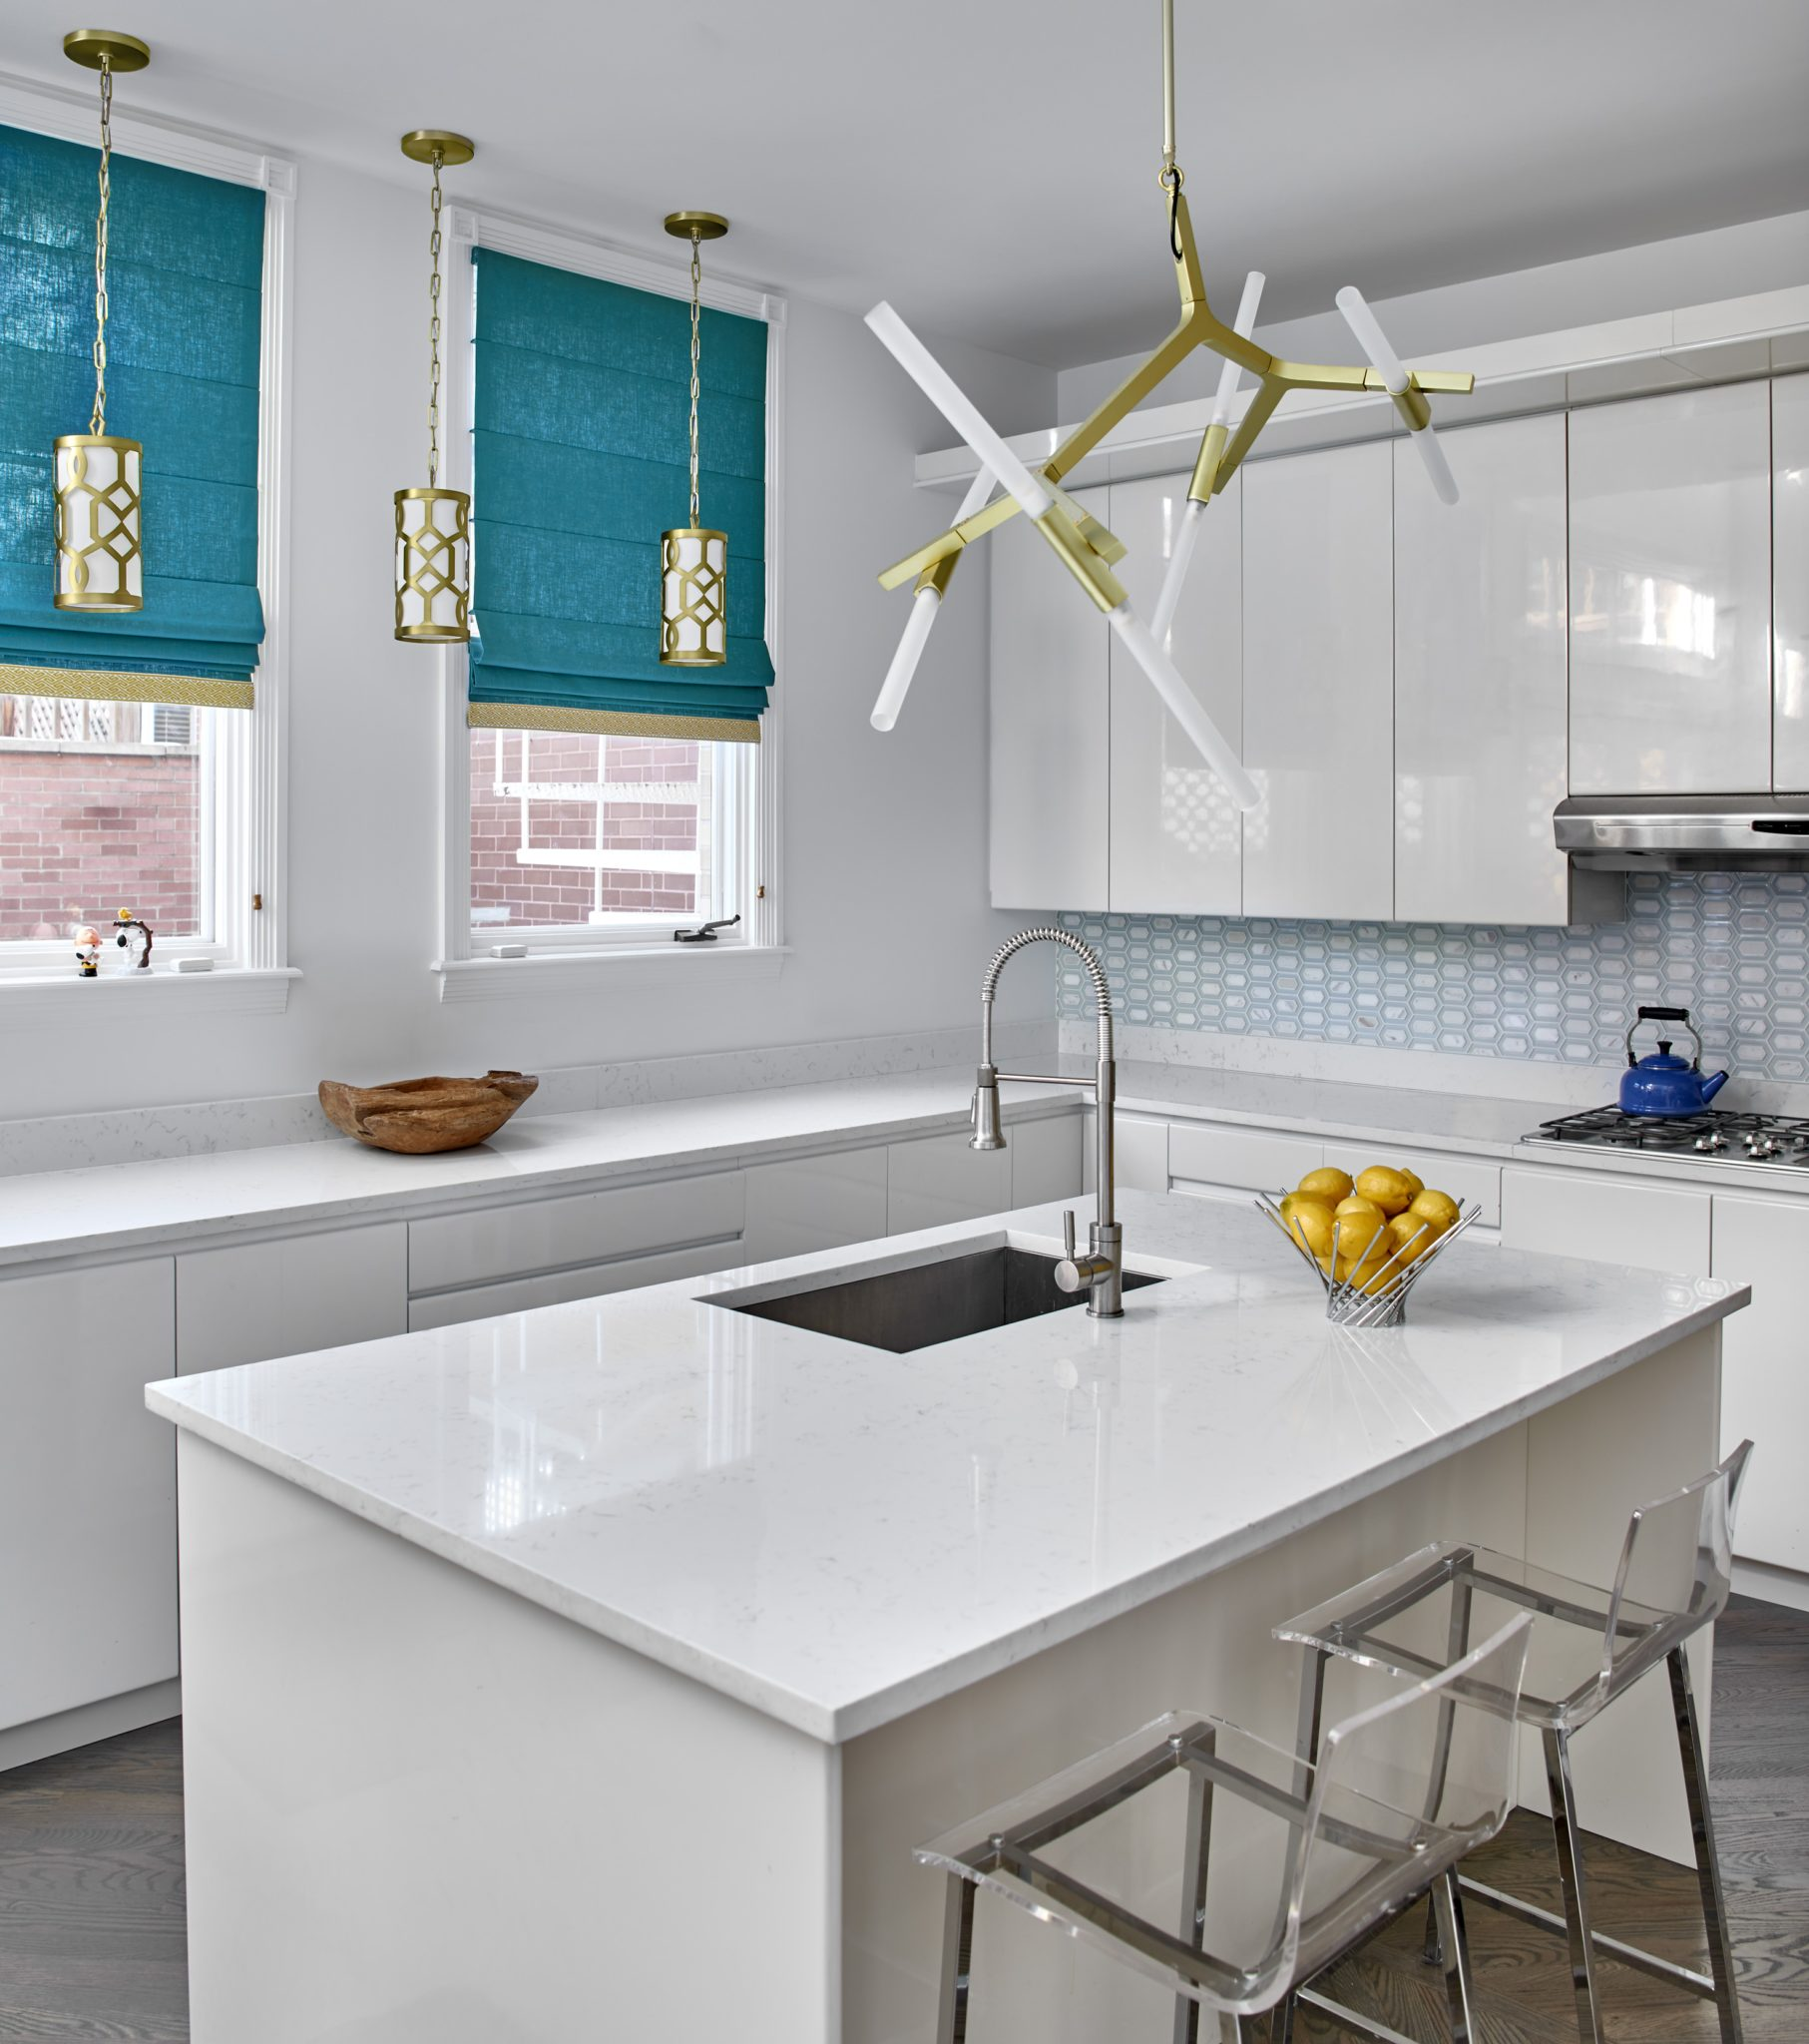 An all-white kitchenby MILIEU